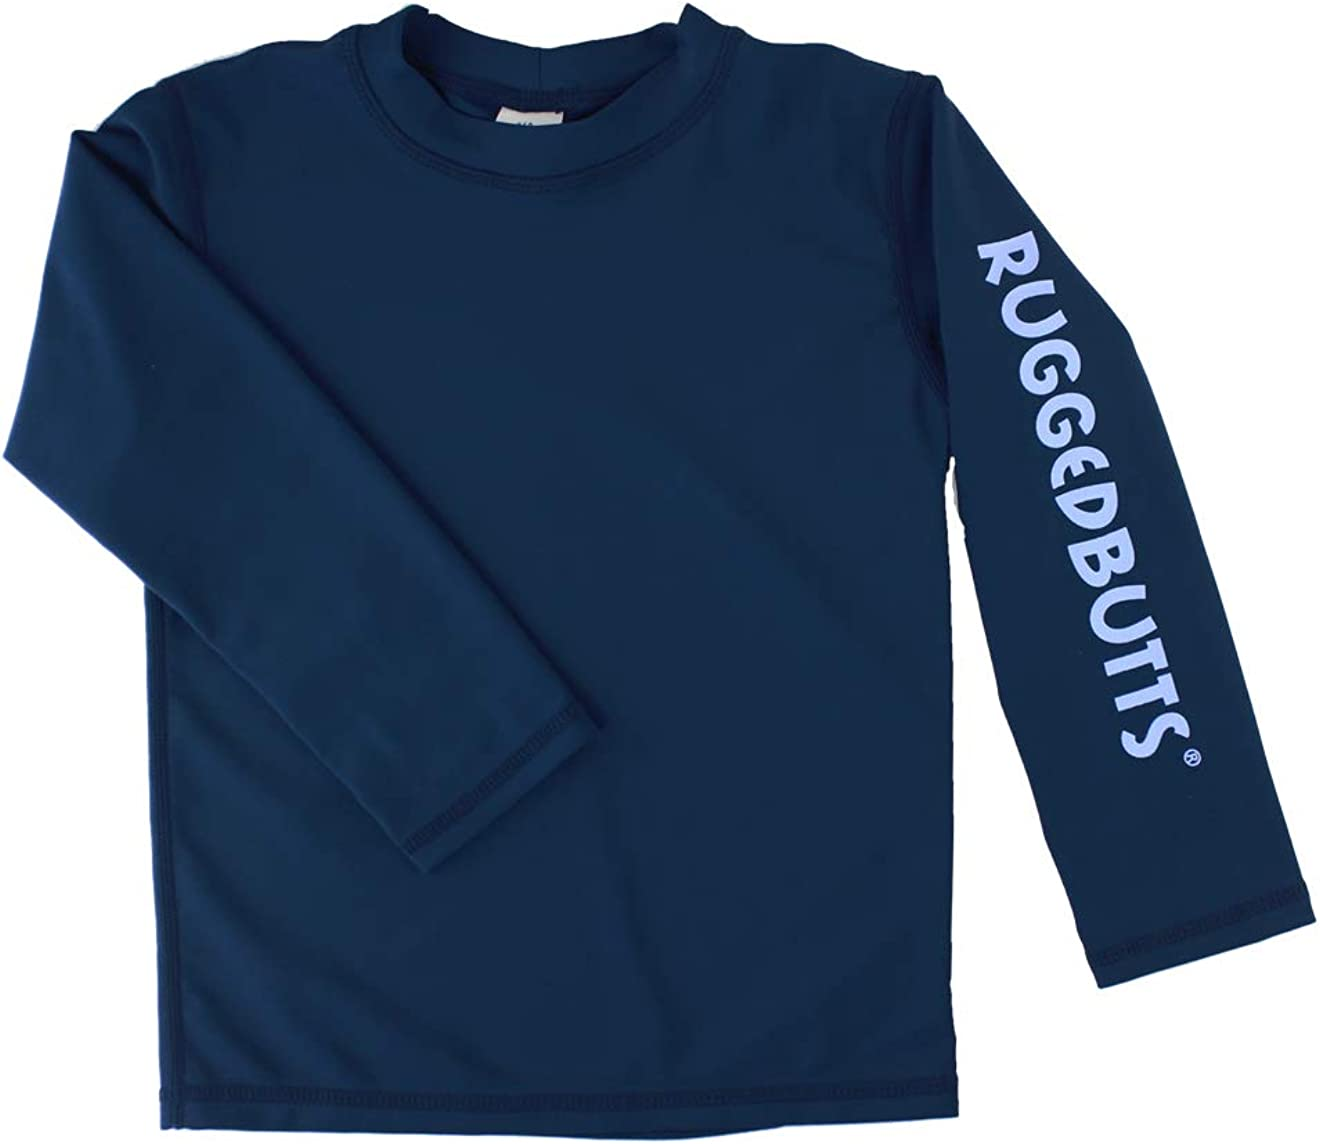 3-6m Sun Protective Rash Guard Surf Swim Shirt RuggedButts Baby//Toddler Boys Navy Long Sleeve UPF 50